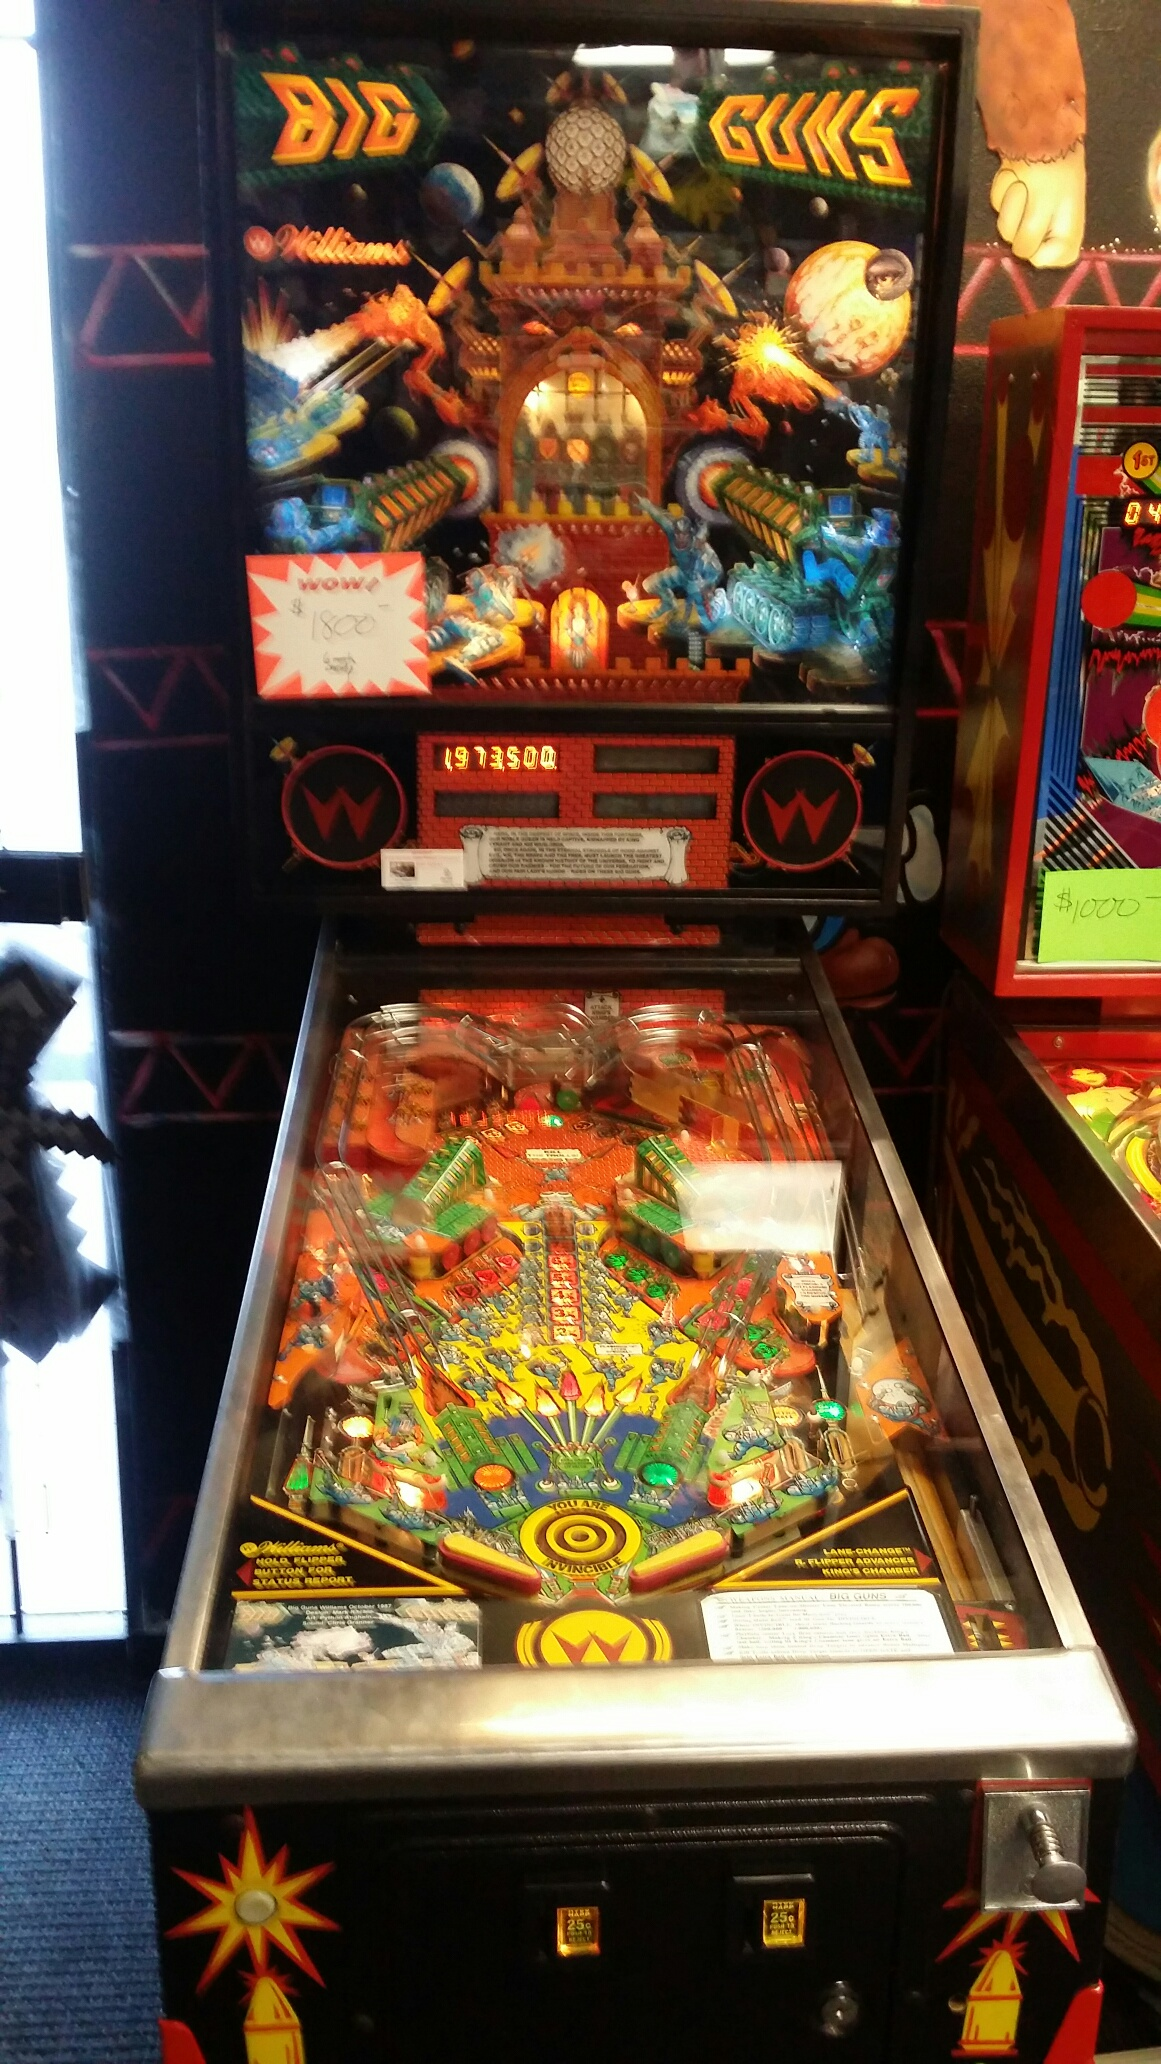 SeanStewart: Big Guns (Pinball: 3 Balls) 1,973,500 points on 2017-07-24 22:58:59